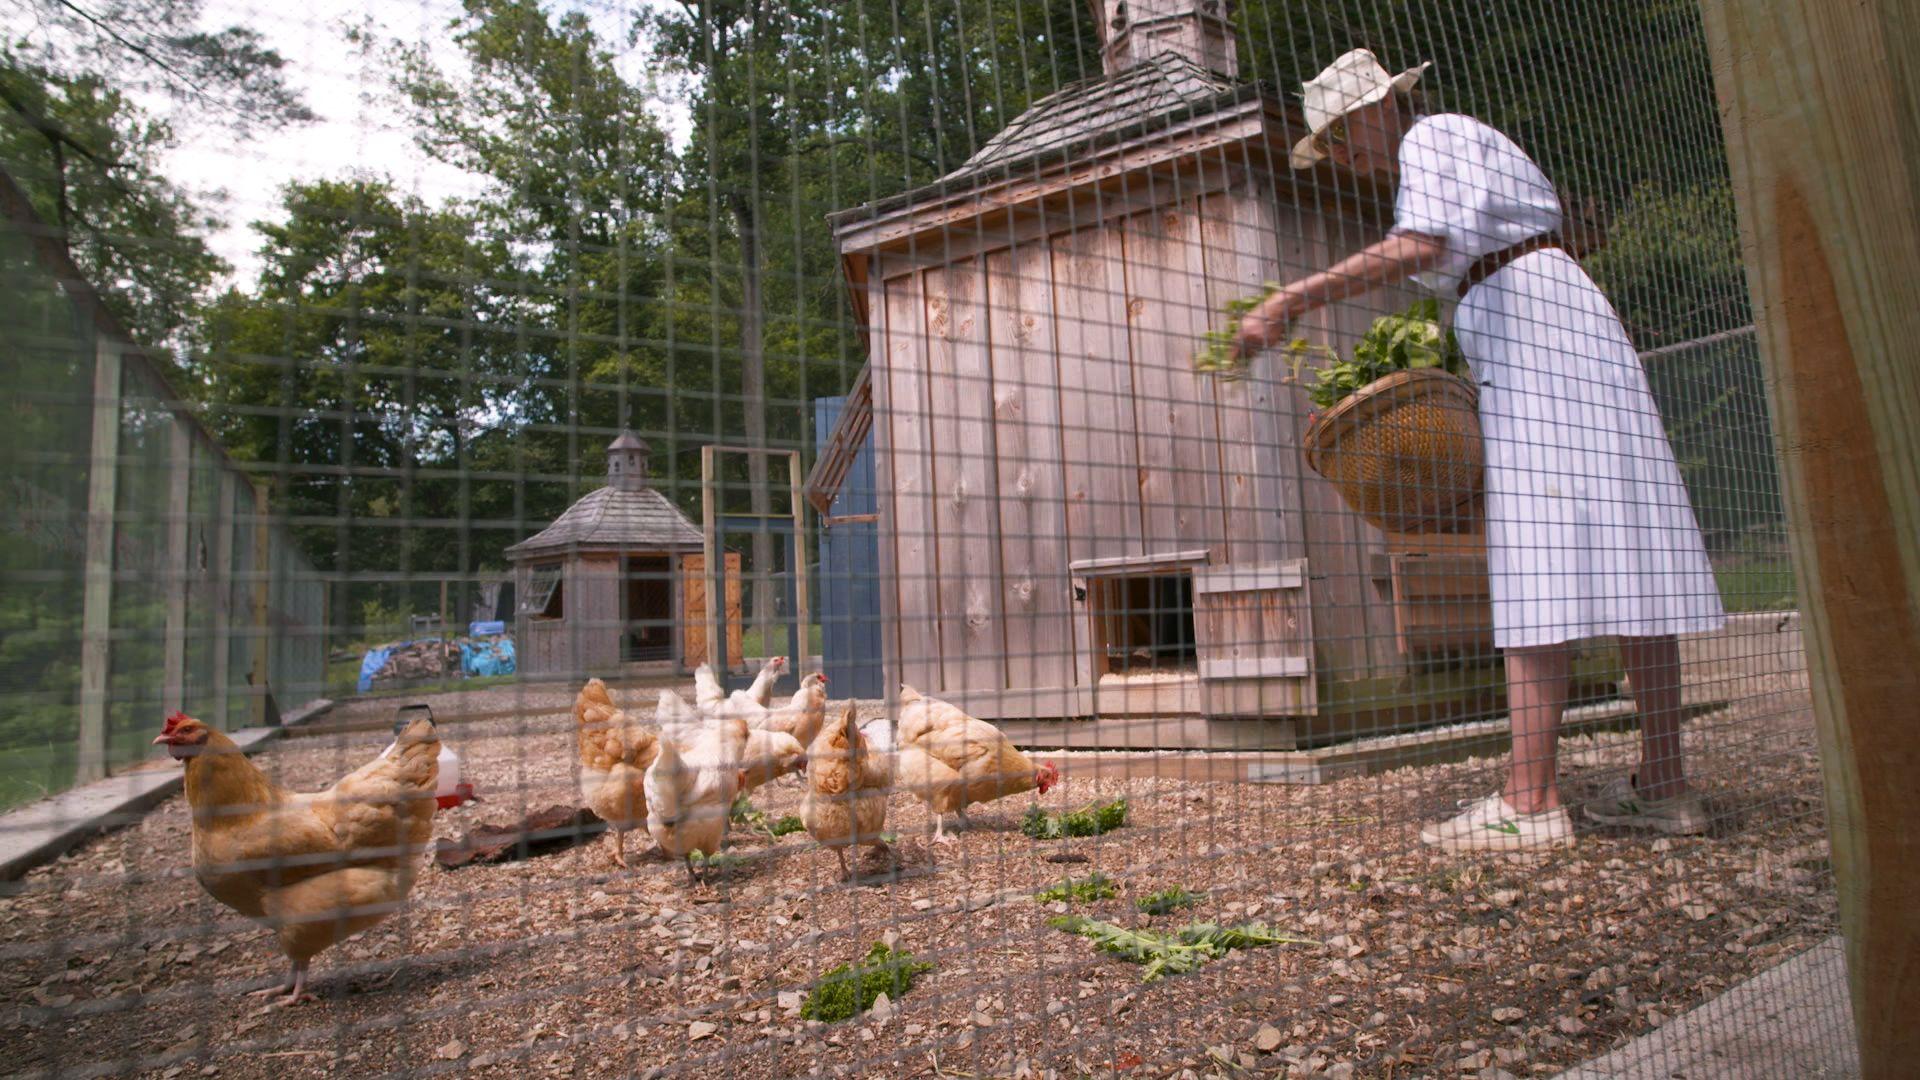 How to Raise Chickens in Your Backyard - Designer Chicken Coop